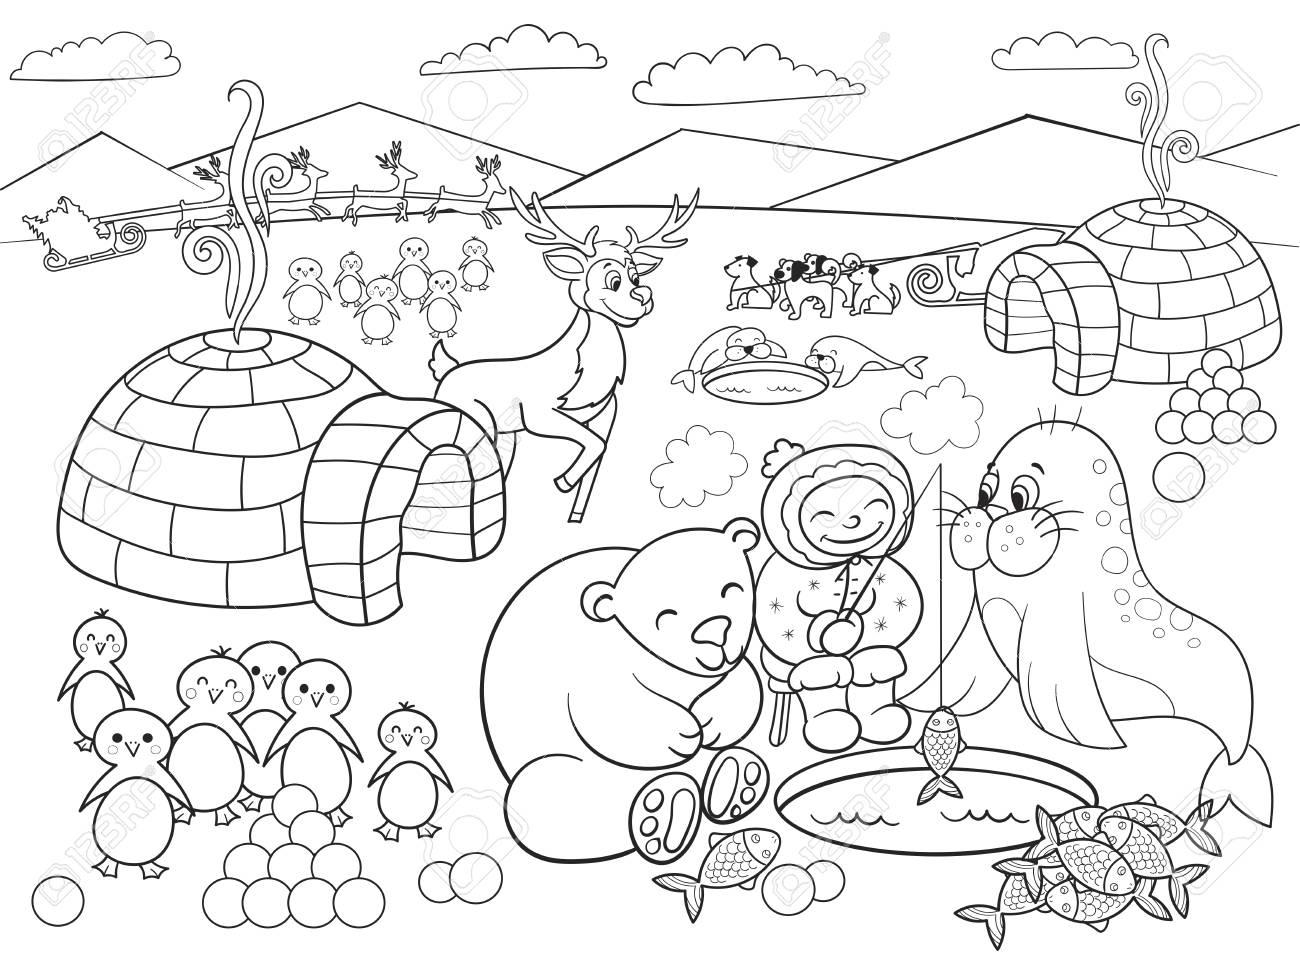 Illustration De Raster Du Pole Nord Coloriage Livre Jeu Educatif